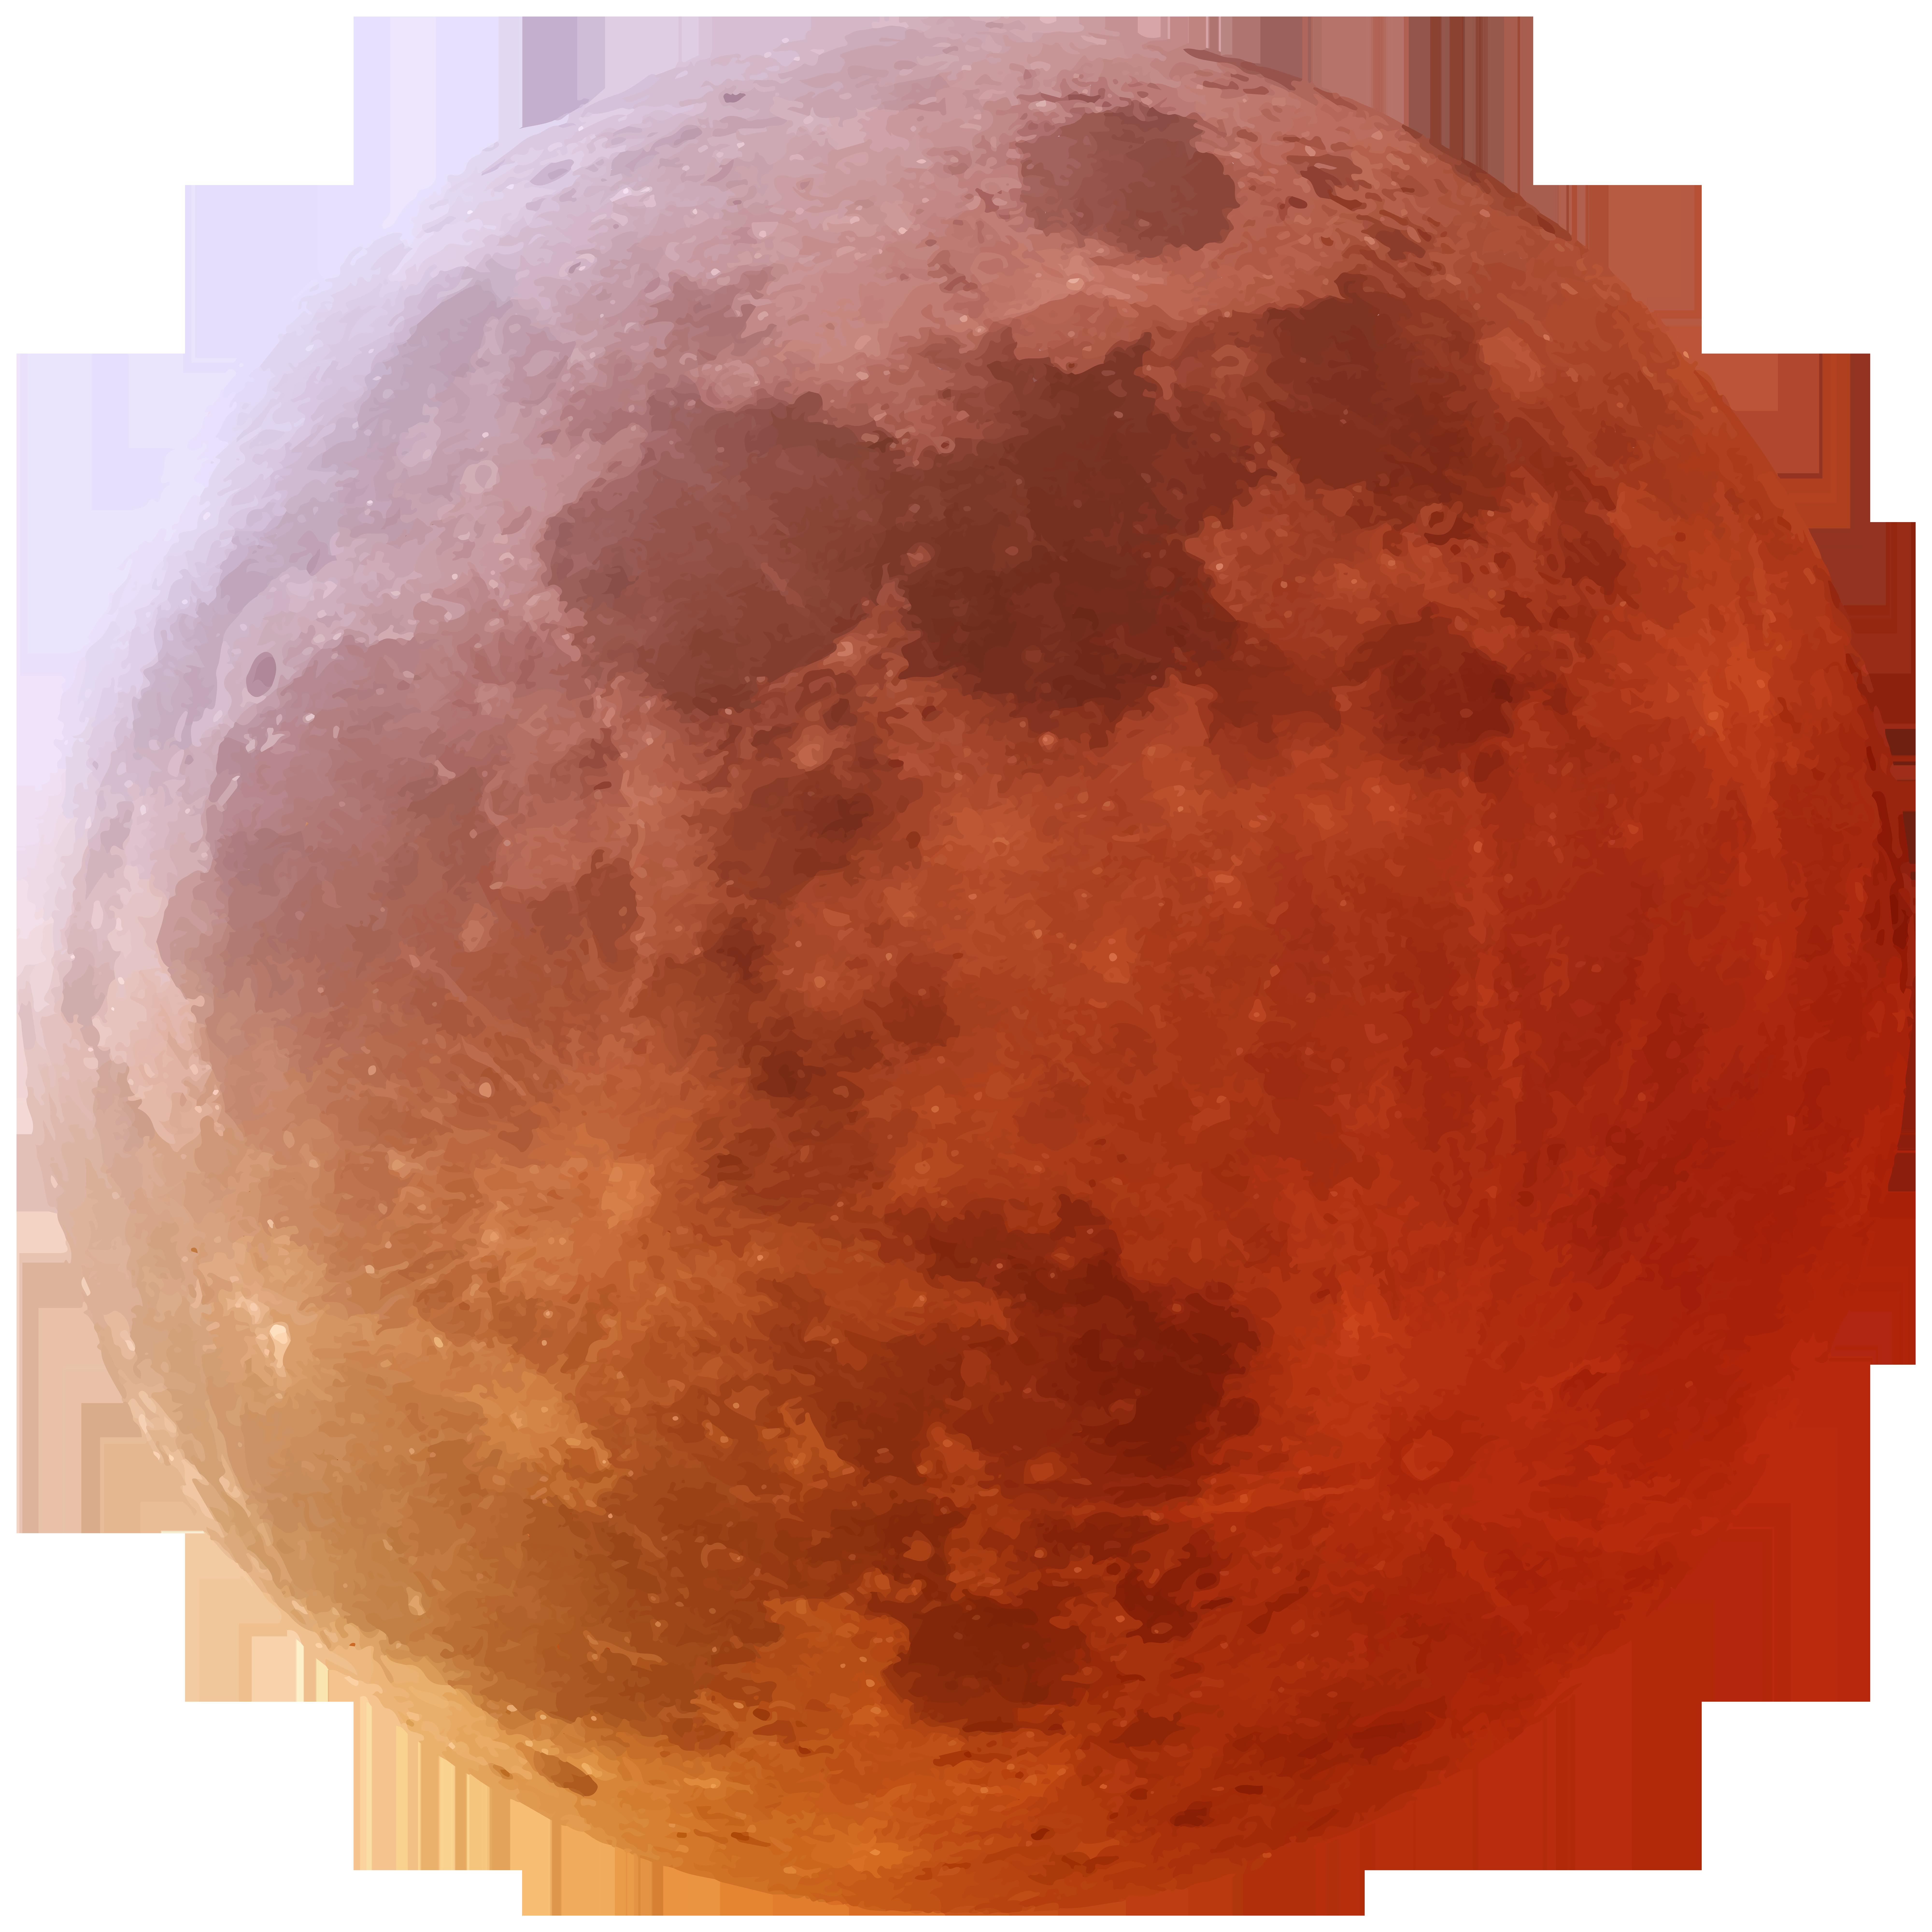 Moon clipart orange, Moon orange Transparent FREE for ...